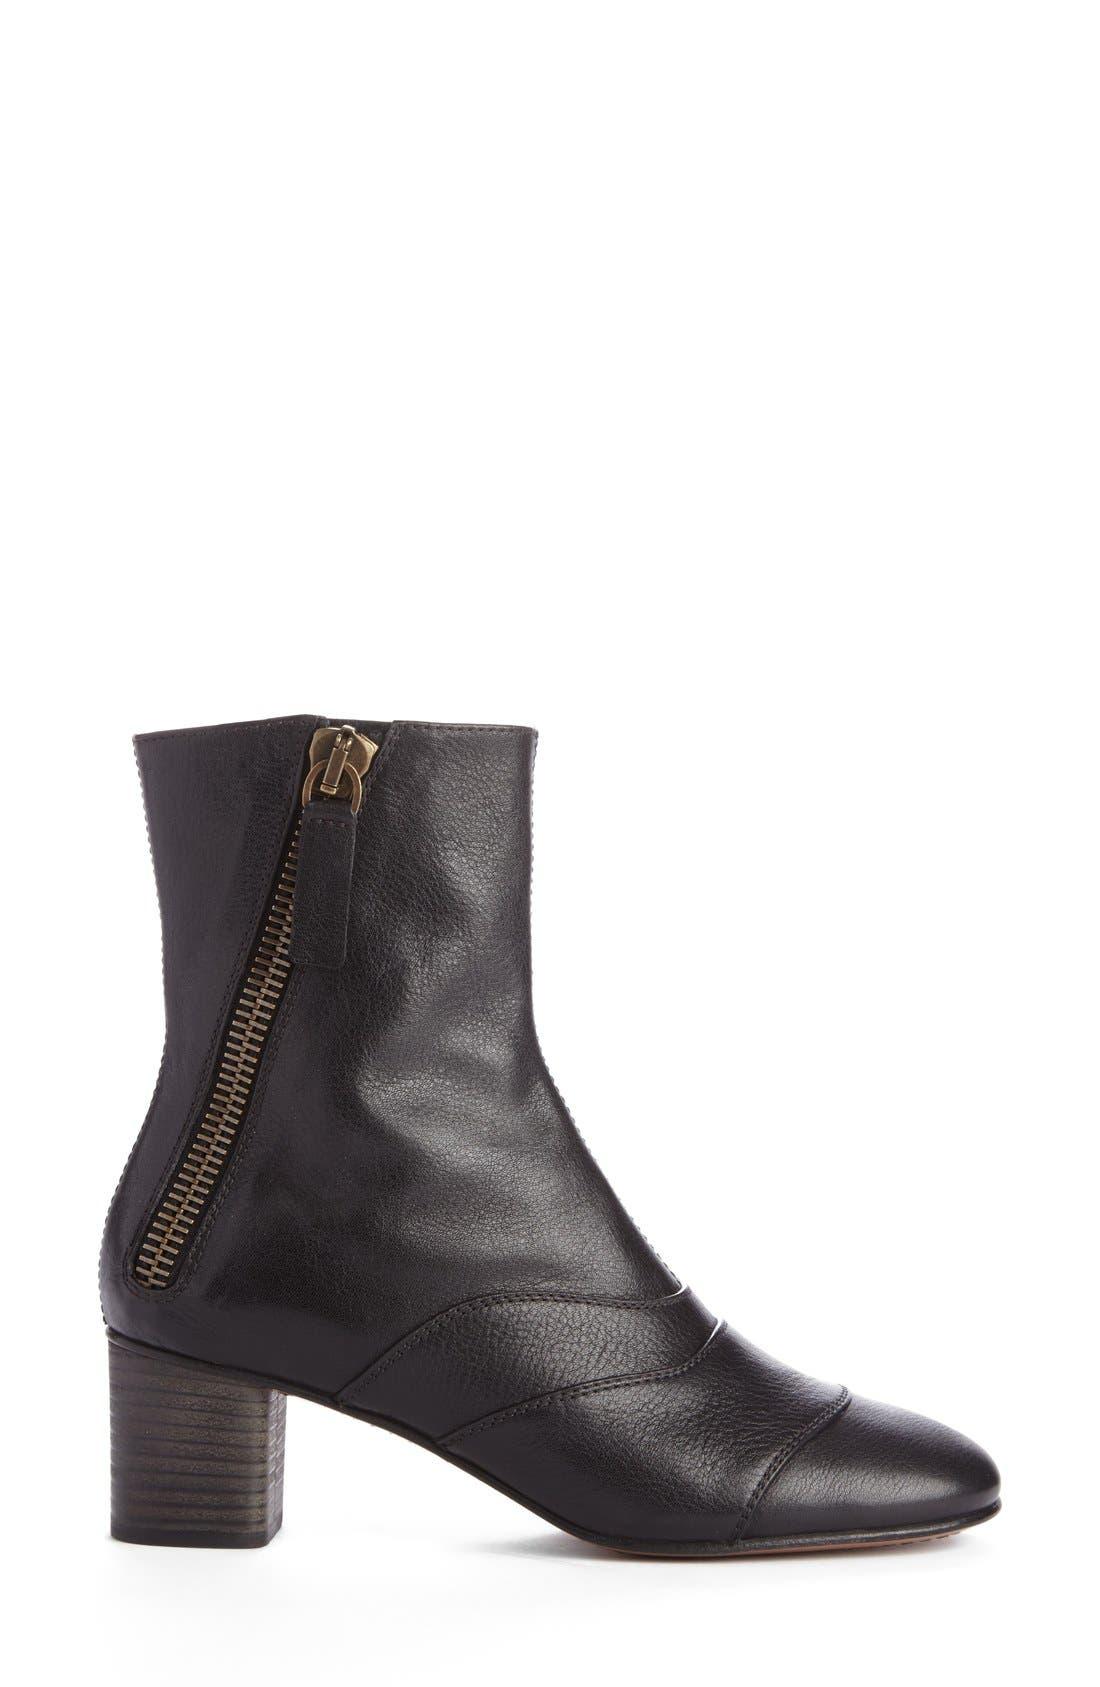 'Lexie' Block Heel Boot,                             Alternate thumbnail 4, color,                             Black Leather